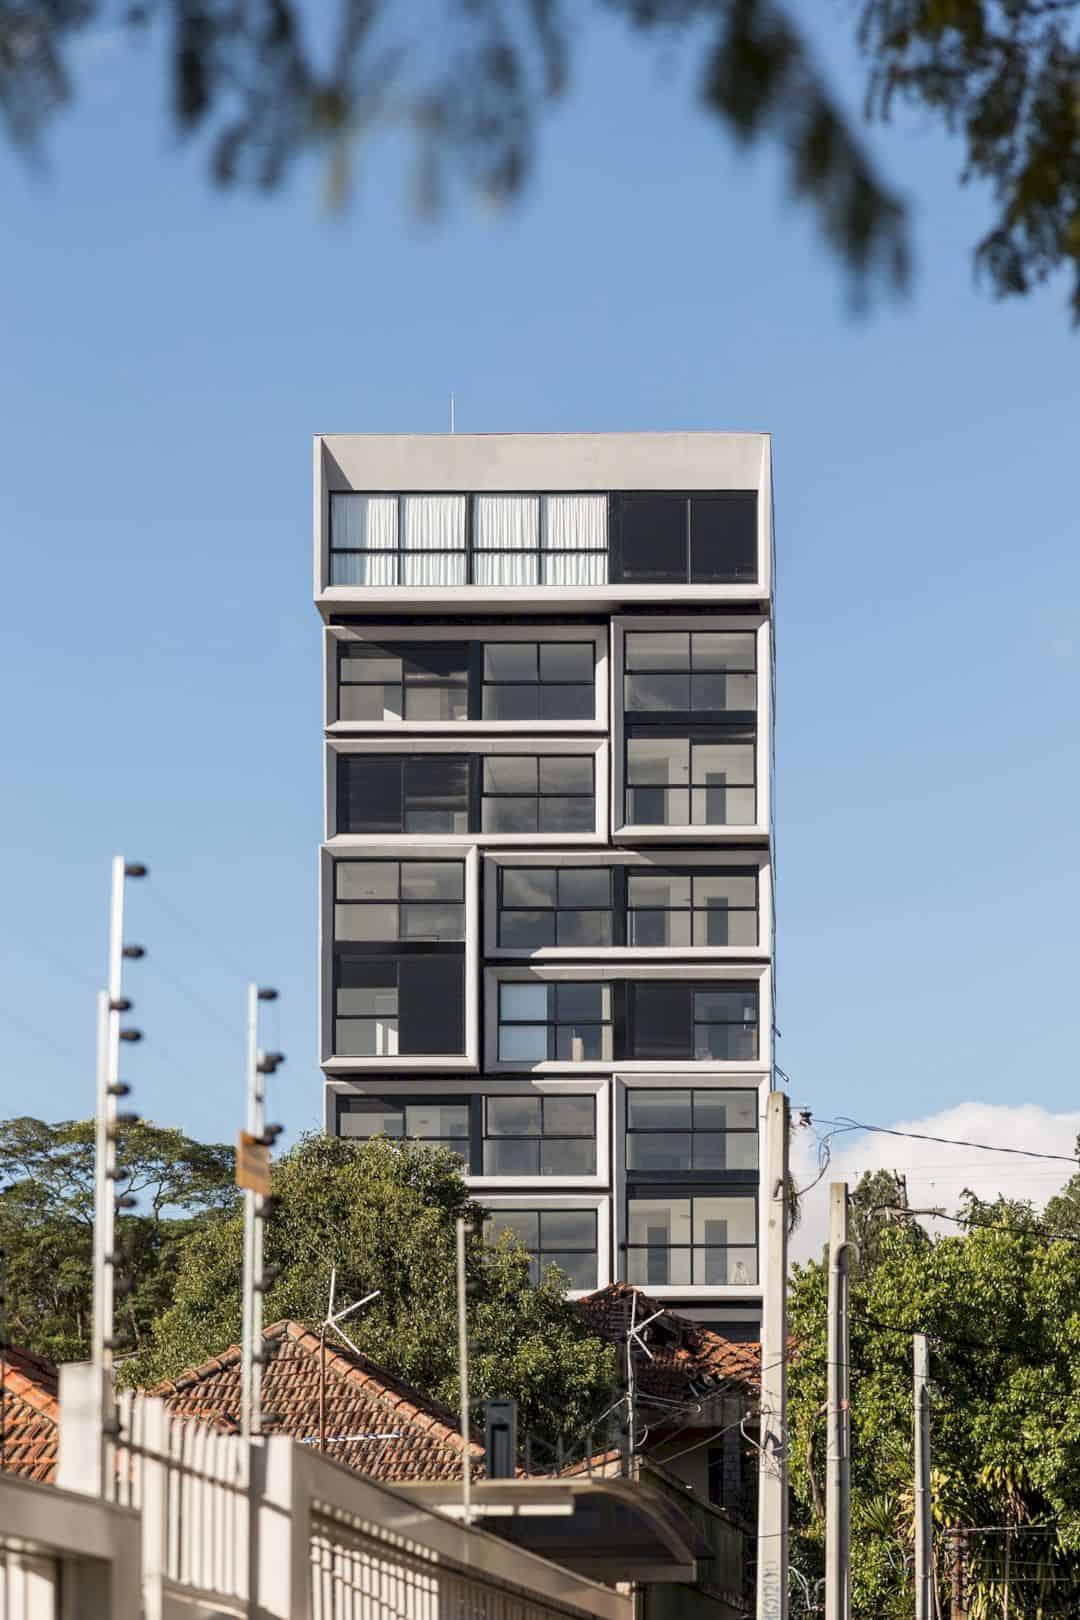 Fernando Abbott 866 A High Rise Residential Building In Porto Alegre 19